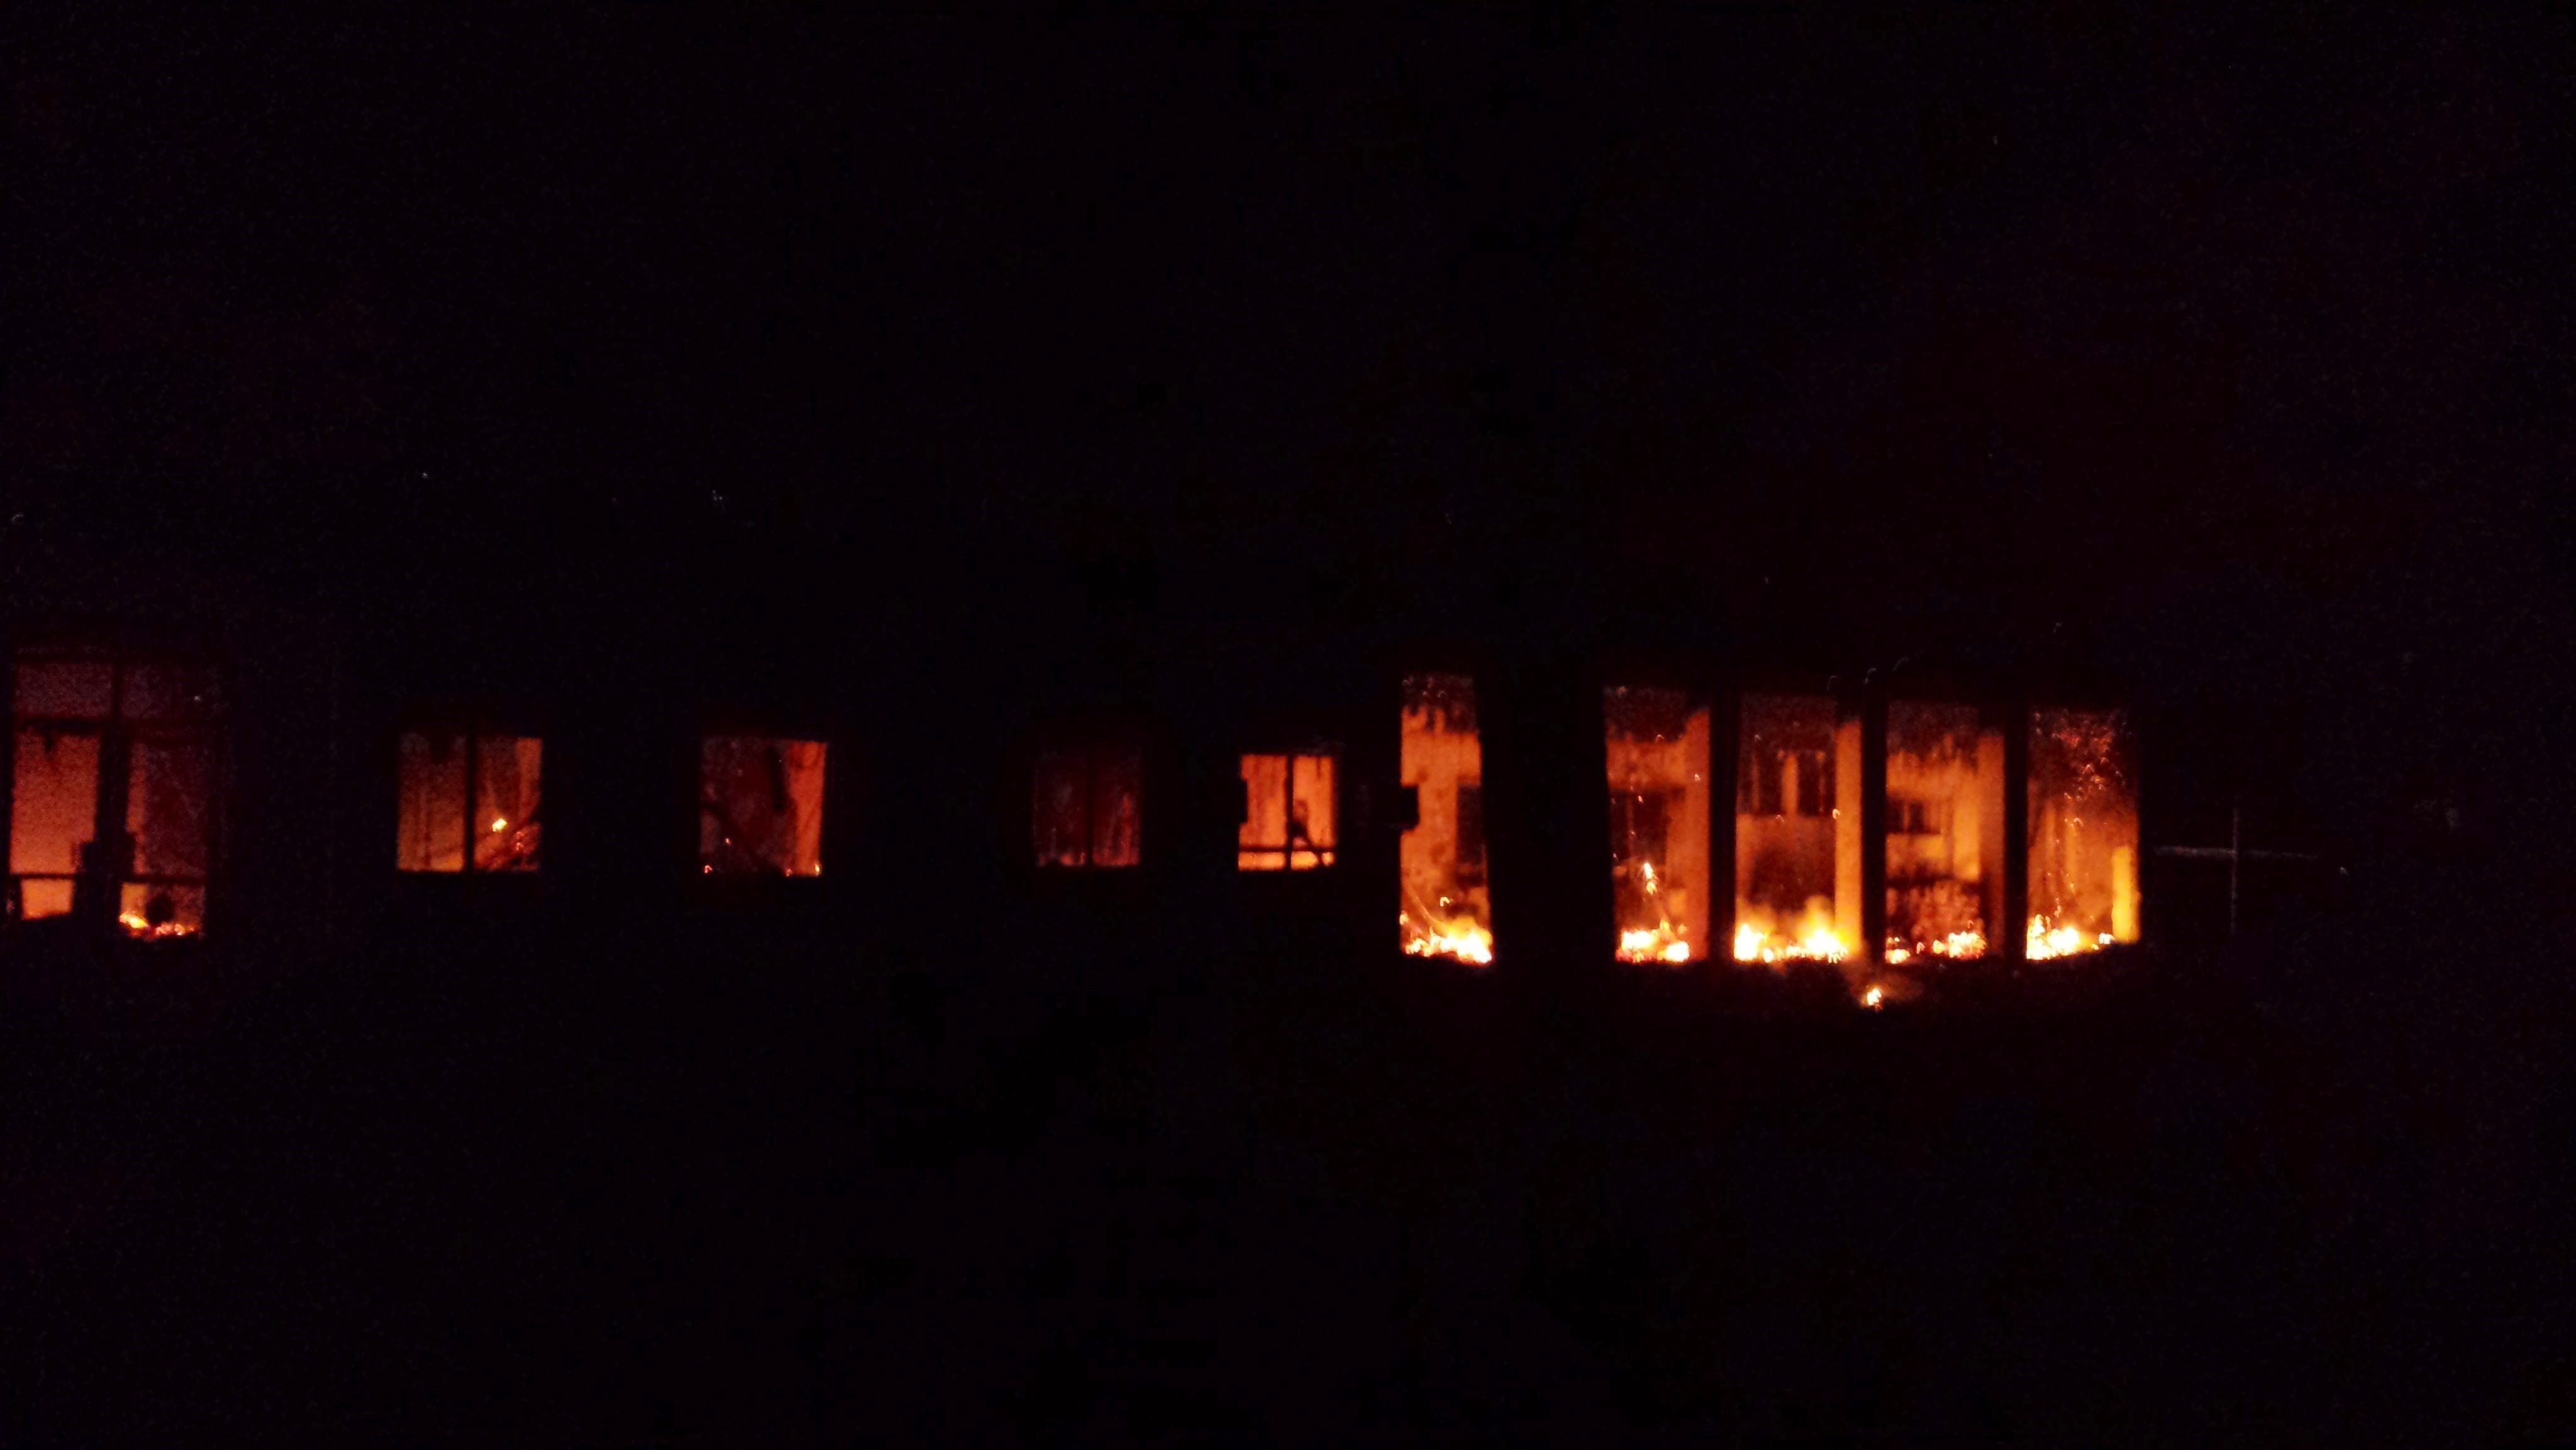 afganistan hospital bombing msf